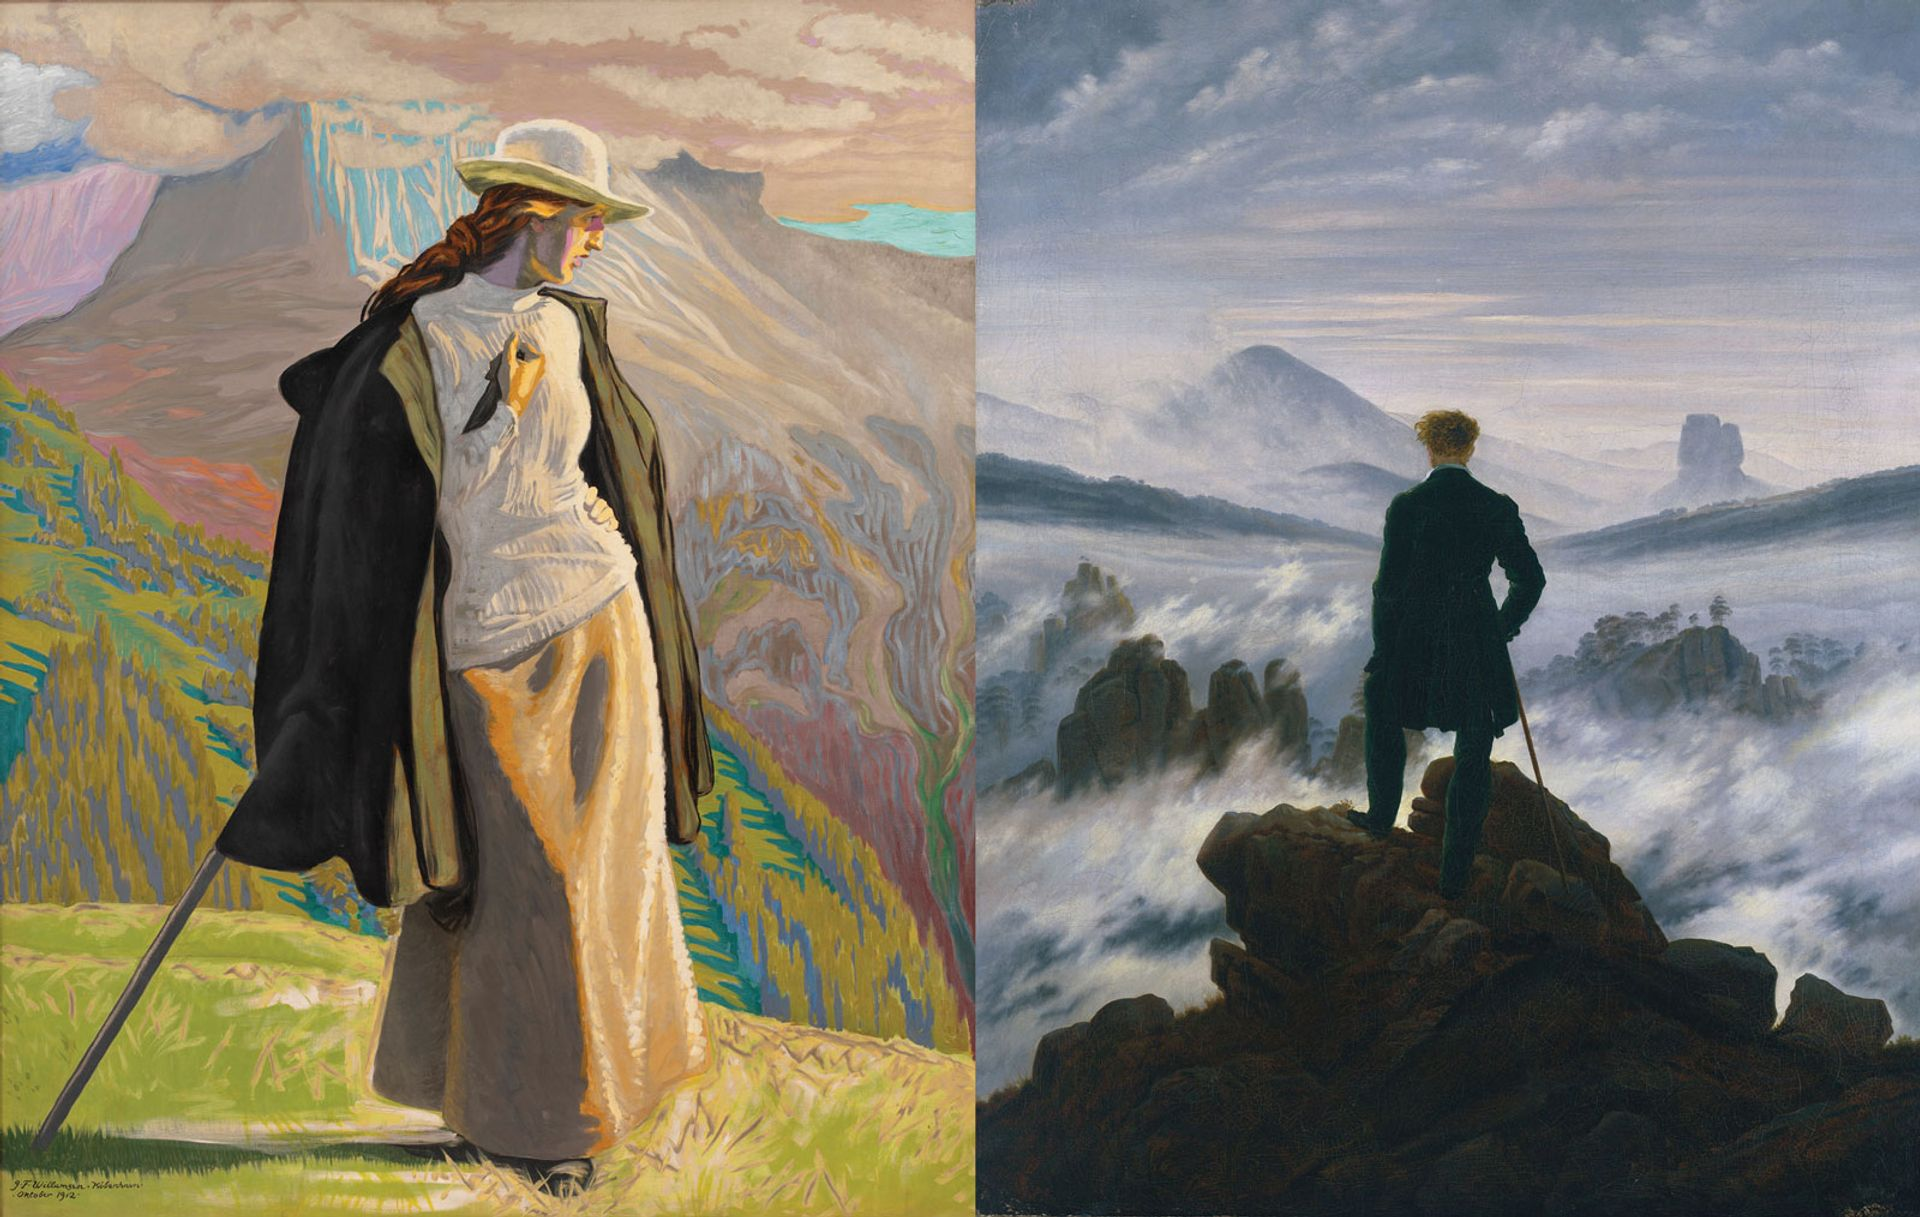 Willumsen's A Mountain Climber (1912, left) and Friedrich's Wanderer above the Sea of Fog (around 1817, right) Willumsen: Statens Museum for Kunst, Copenhagen; Friedrich: SHK/Hamburger Kunsthalle/bpk/Elke Walford